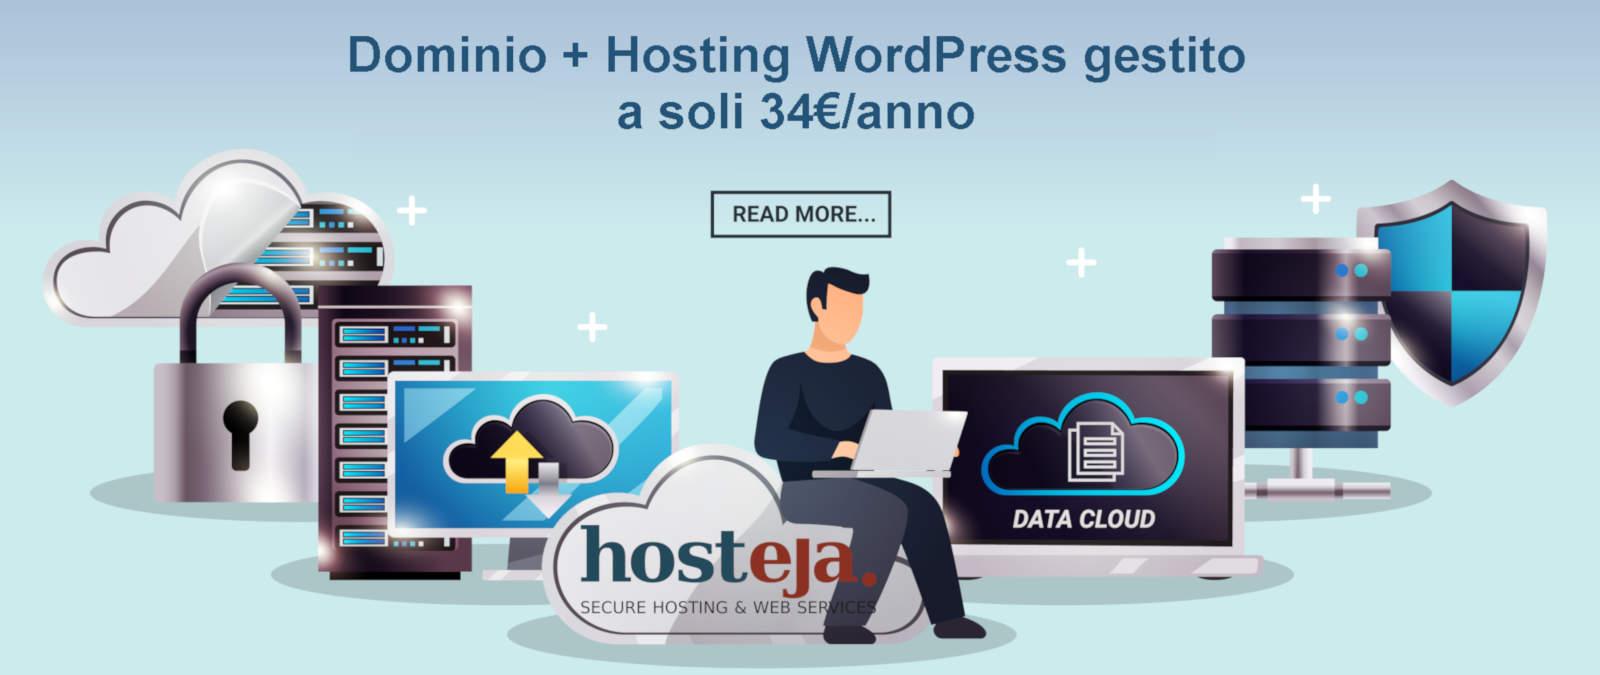 Dominio + Hosting WordPress gestito, Hosteja.com - Hosting Service Provider